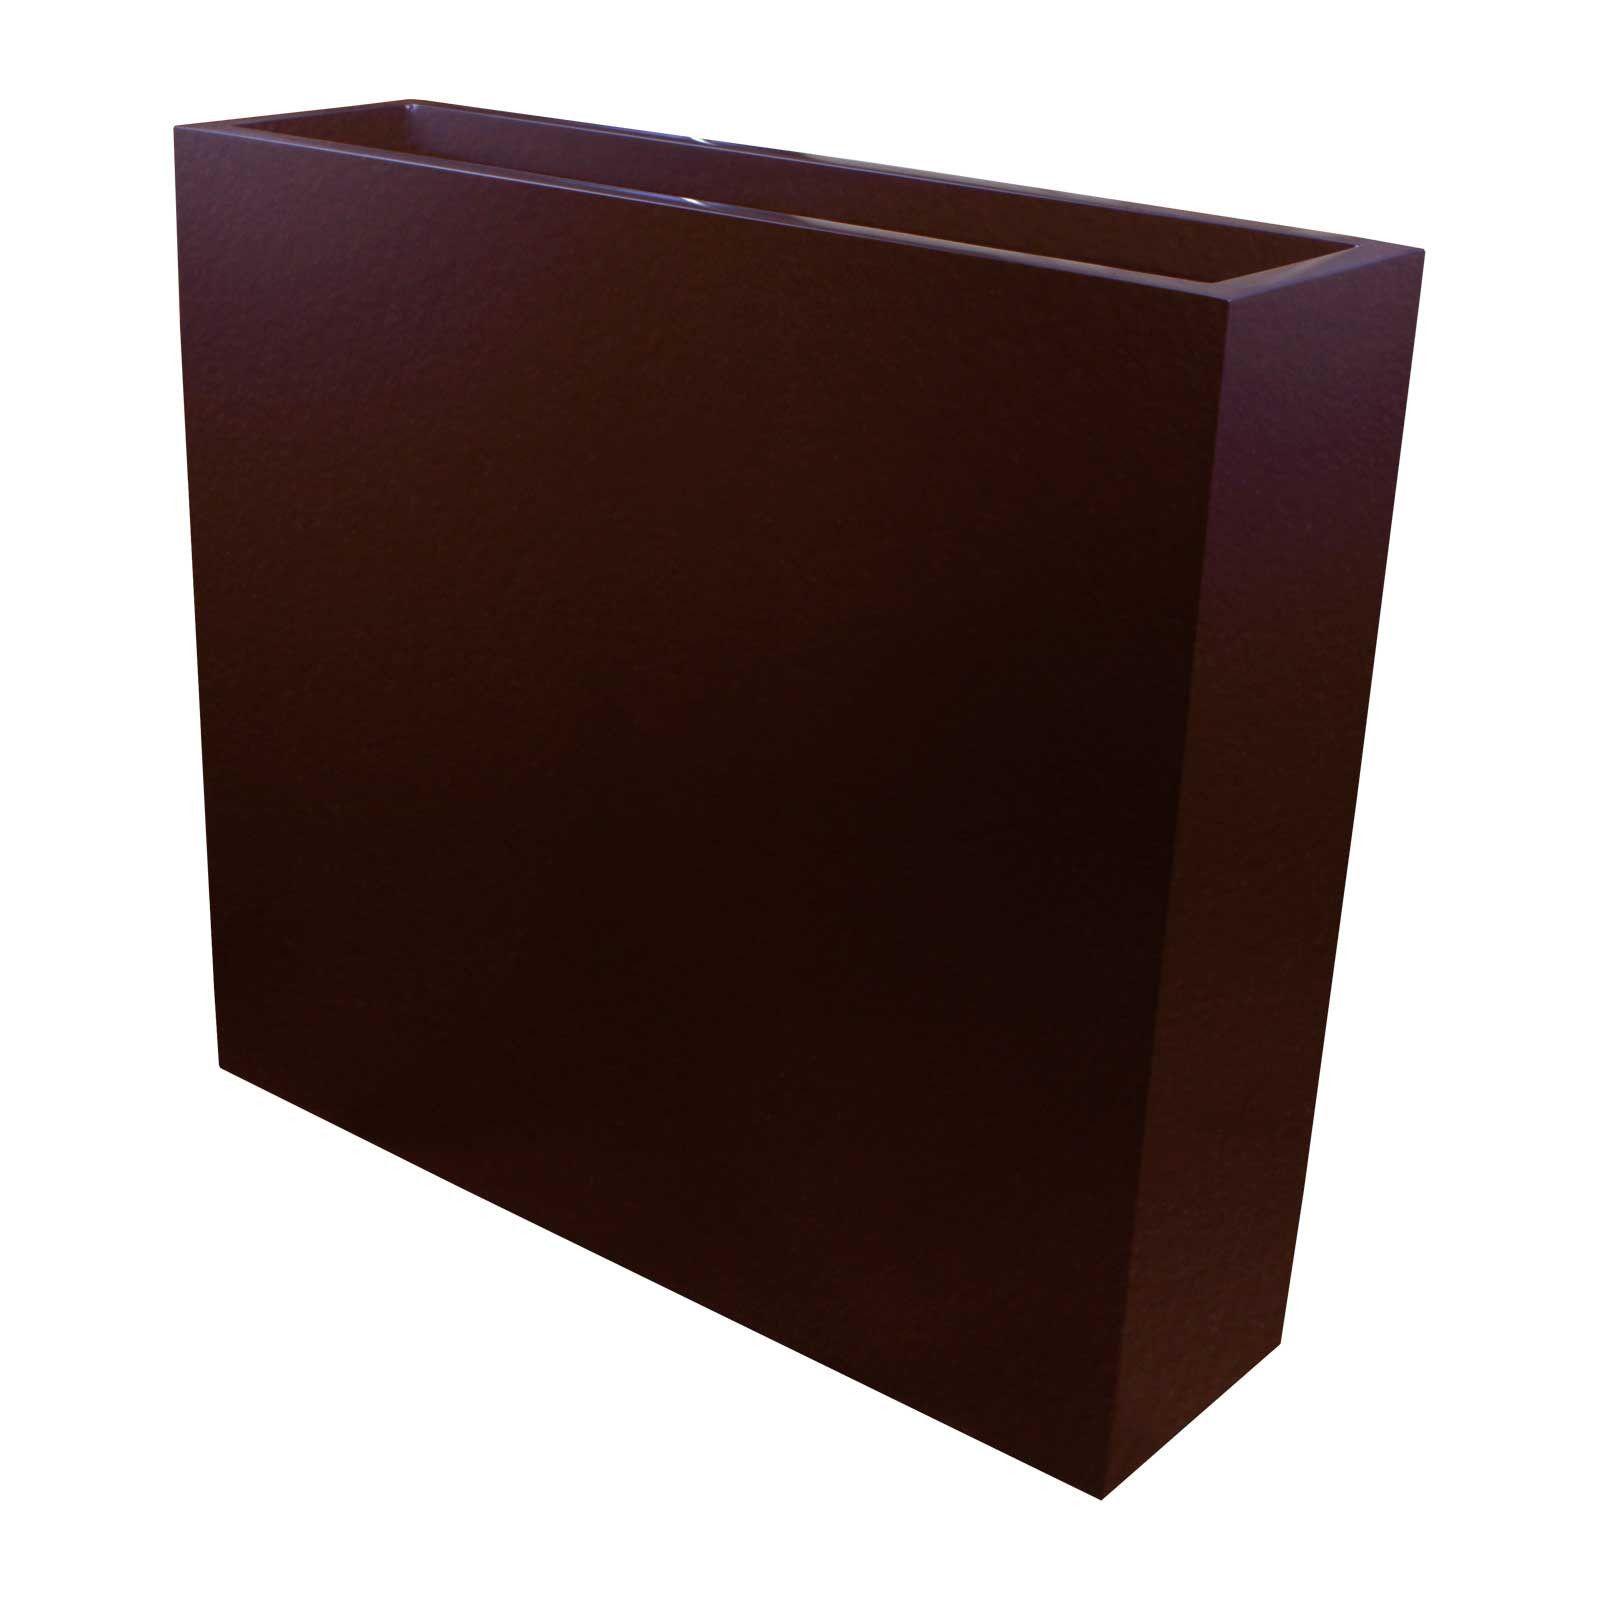 "Tall Narrow Planter Boxes Fiberglass 32"" Tall 24"" 36"" Length"